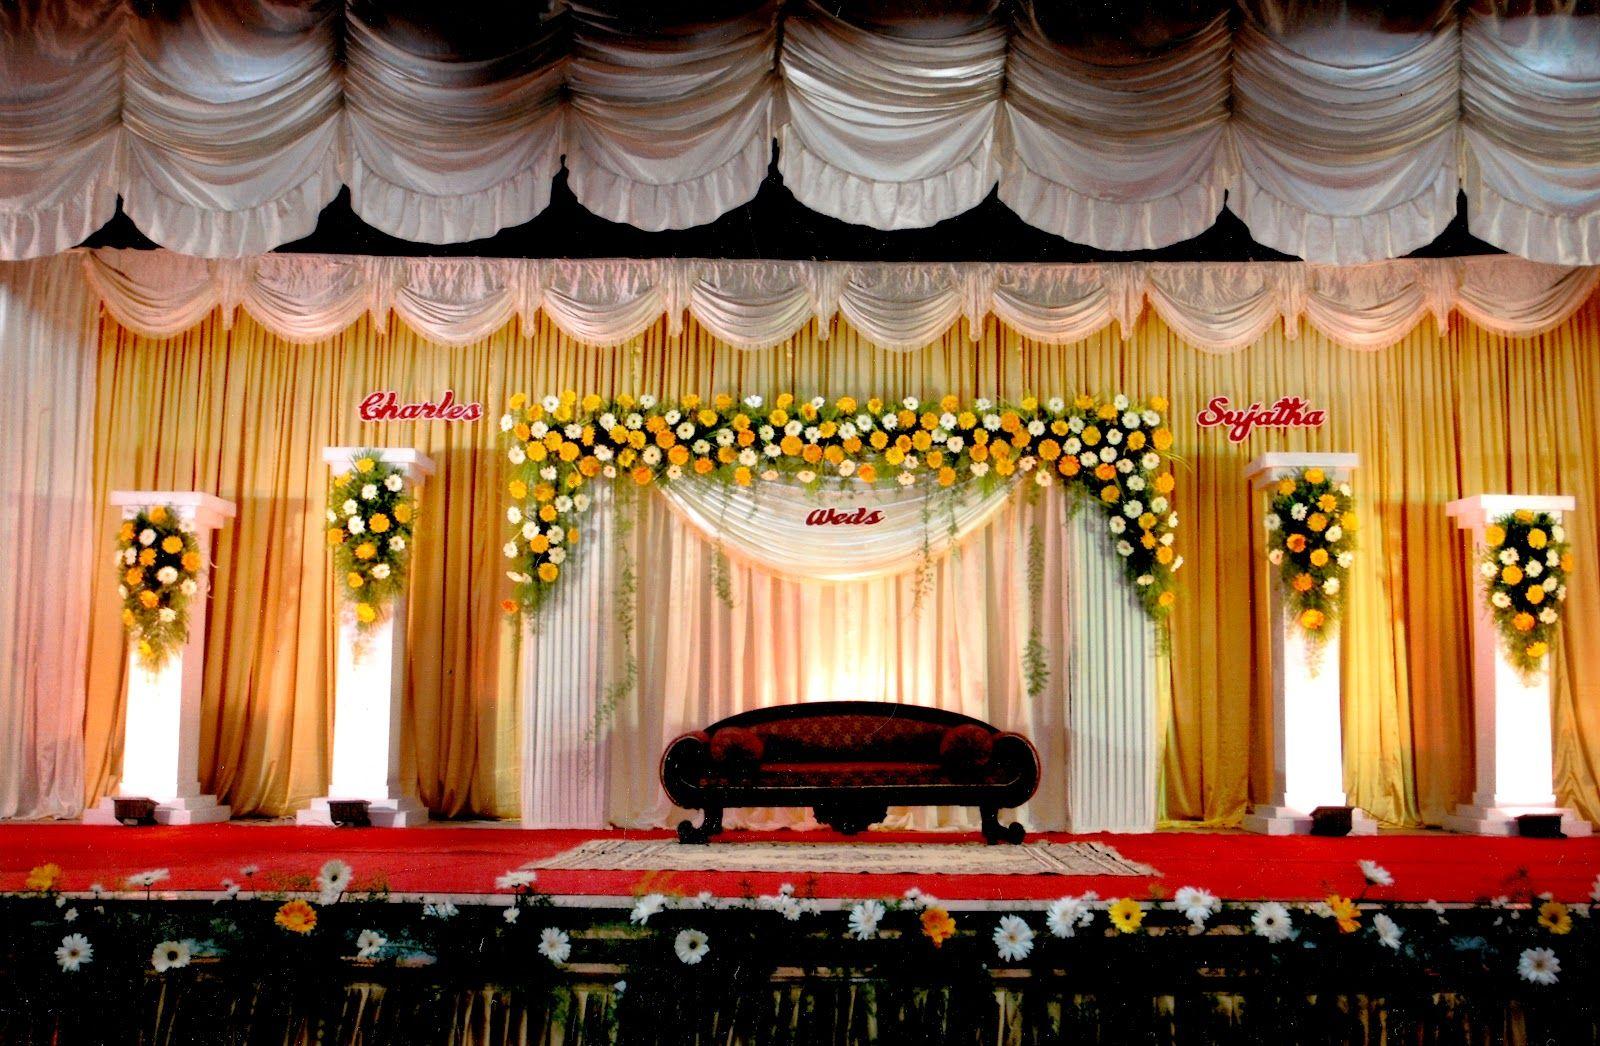 Orange traditional wedding decor  Perfect traditional wedding decor bookeventz wedding weddingdecor